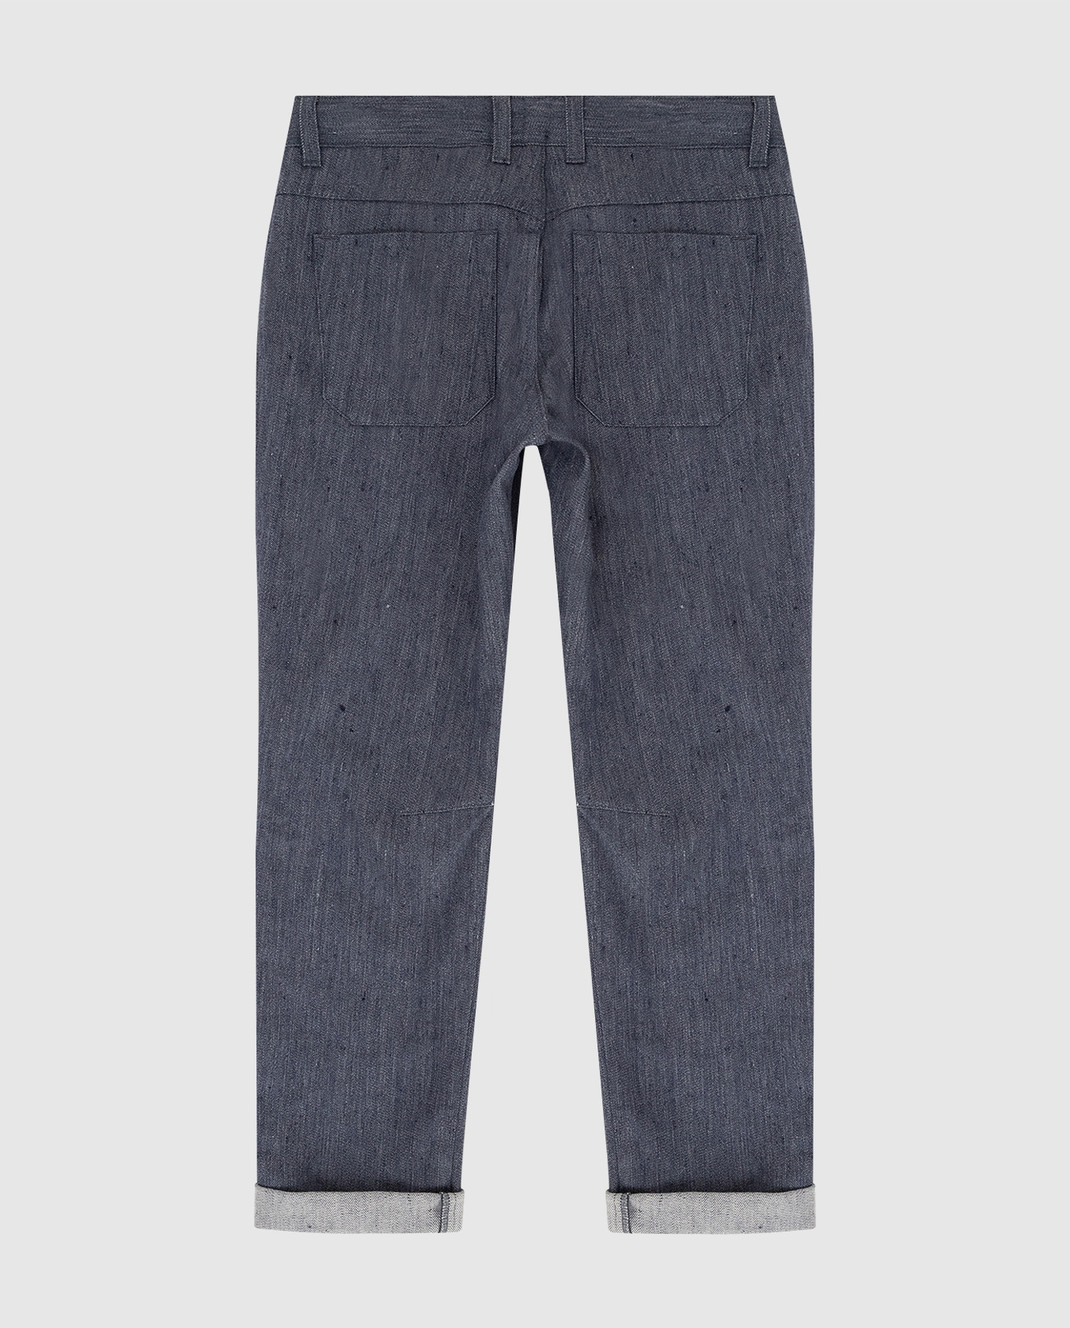 Loro Piana Детские темно-синие джинсы F1FAI0810 изображение 2